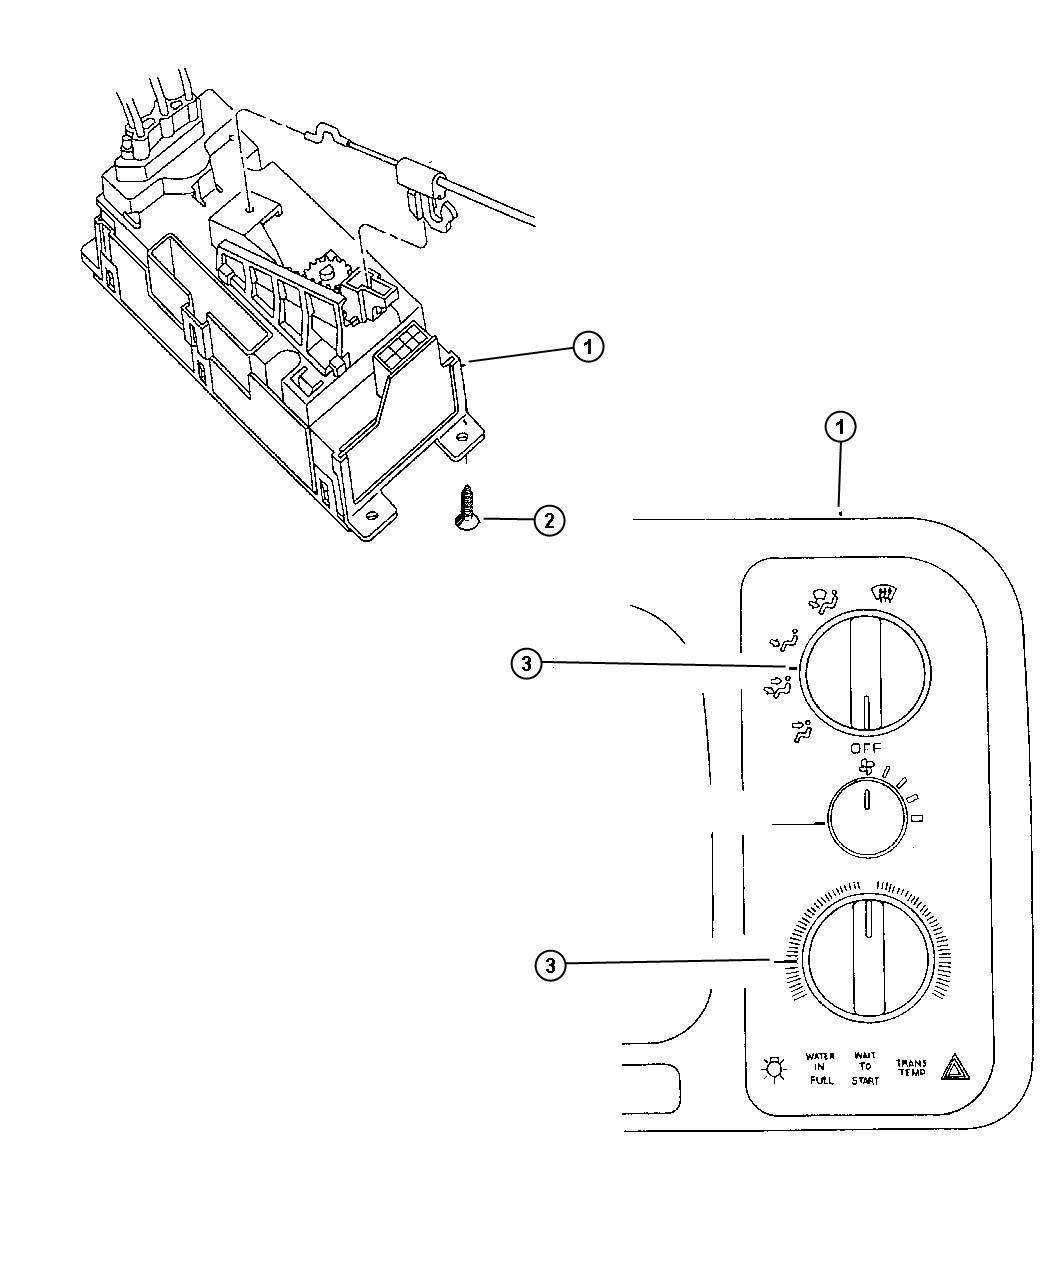 Dodge Ram 1500 Screw. Oval head, self tapping. 164-18x.819